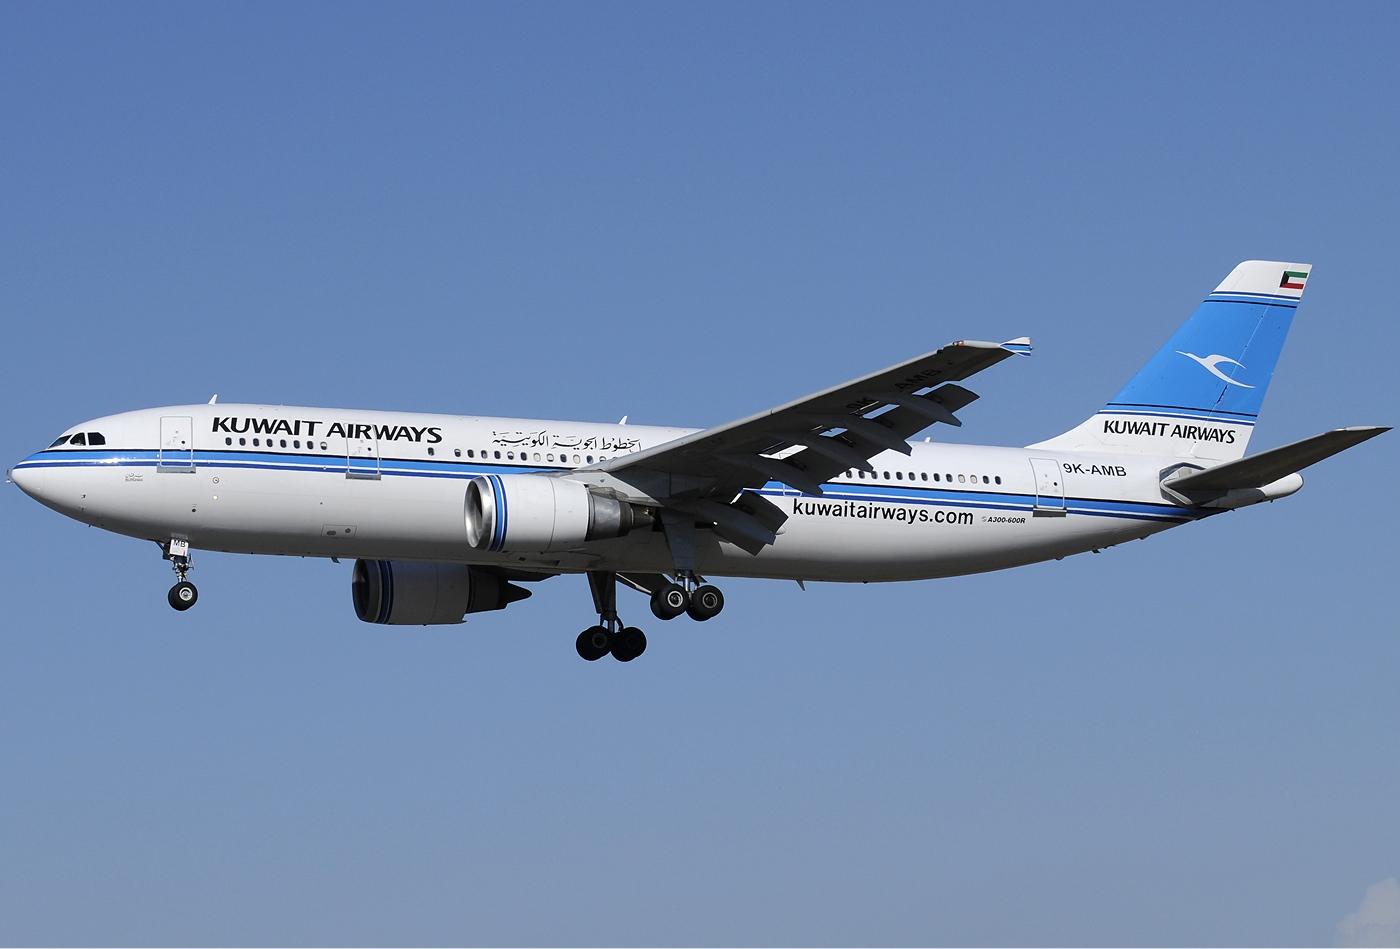 Кувейтские авиалинии (Kuwait Airways).2